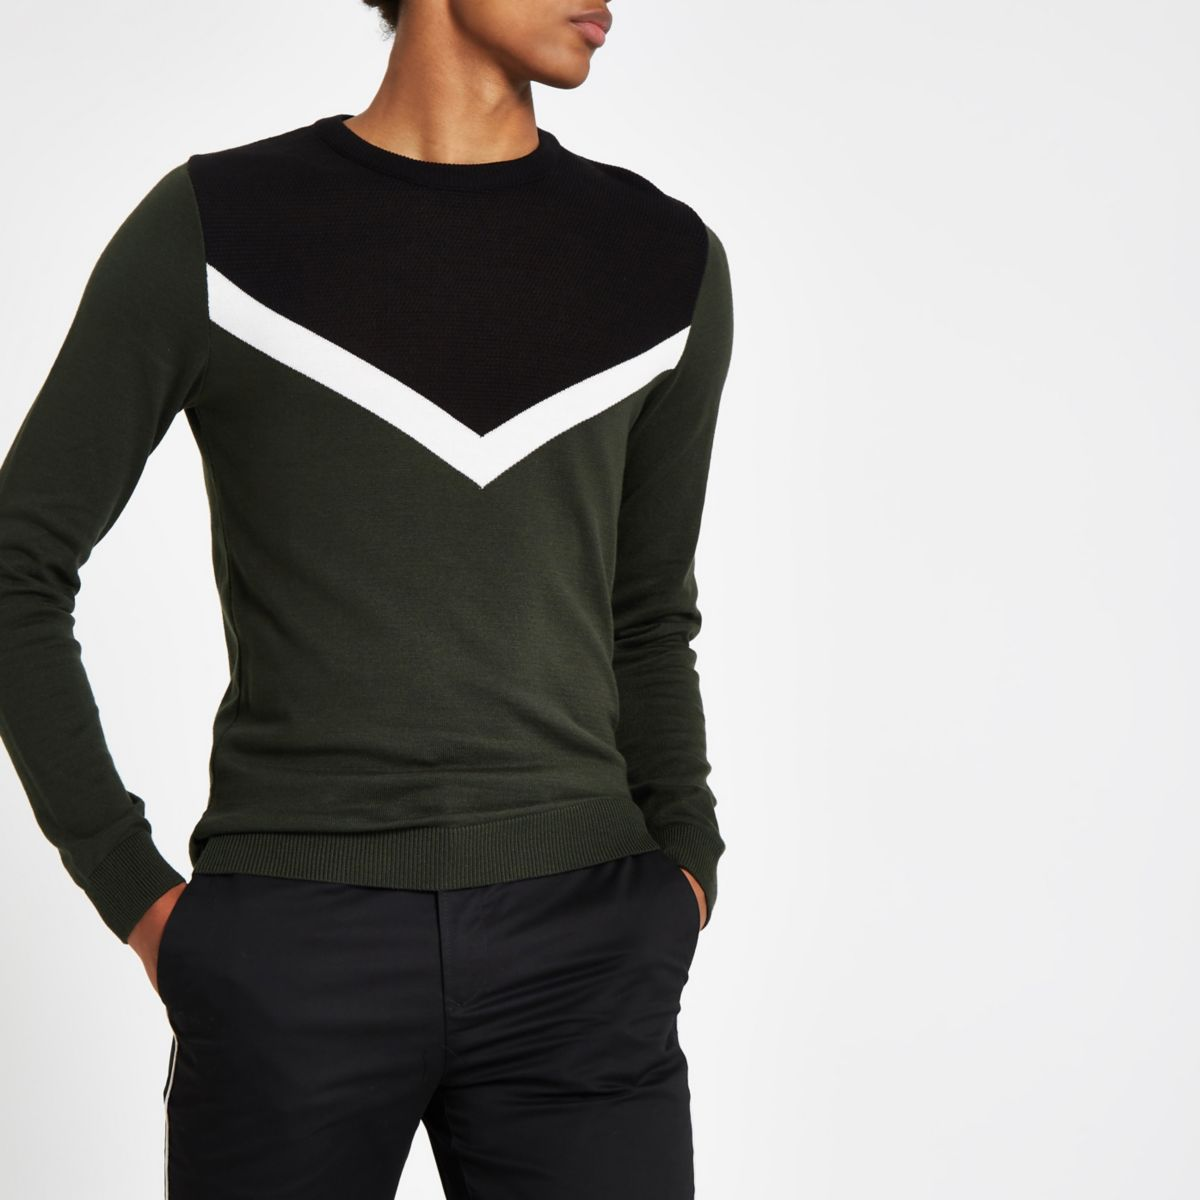 Green contrast crew neck sweater